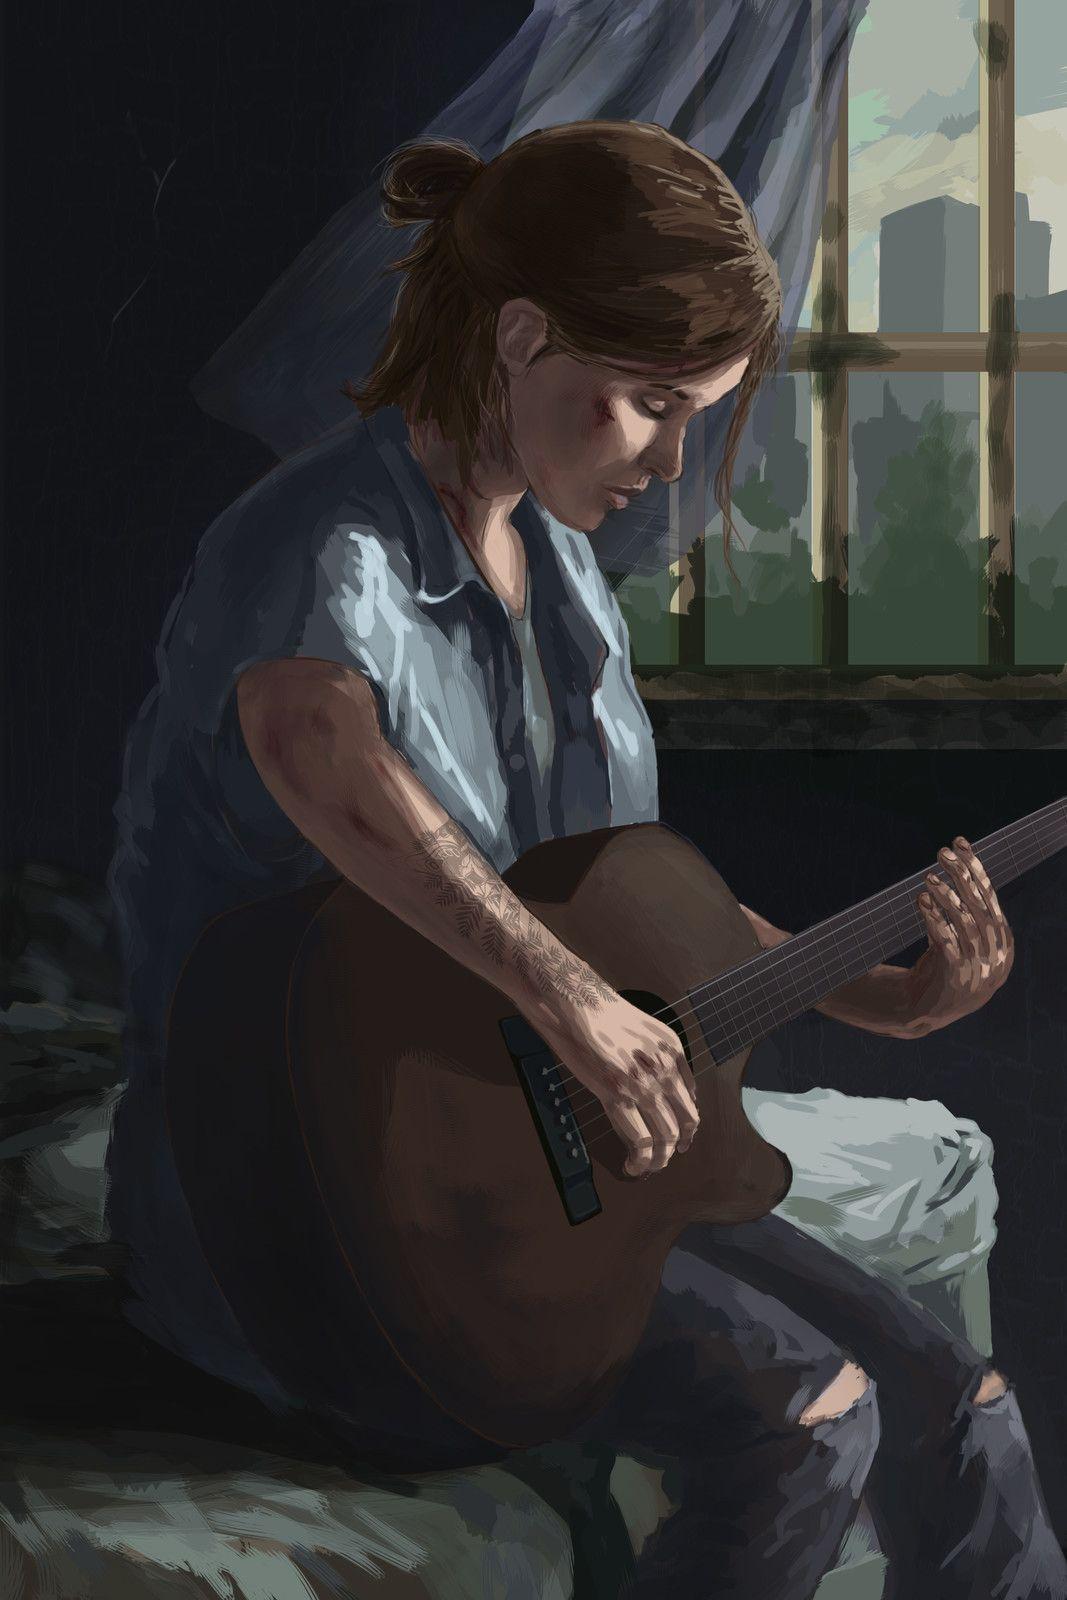 Ellie From The Last Of Us Part 2 An Molica On Artstation At Https Www Artstation Com Artwork 3xa9g The Last Of Us The Last Of Us2 The Lest Of Us